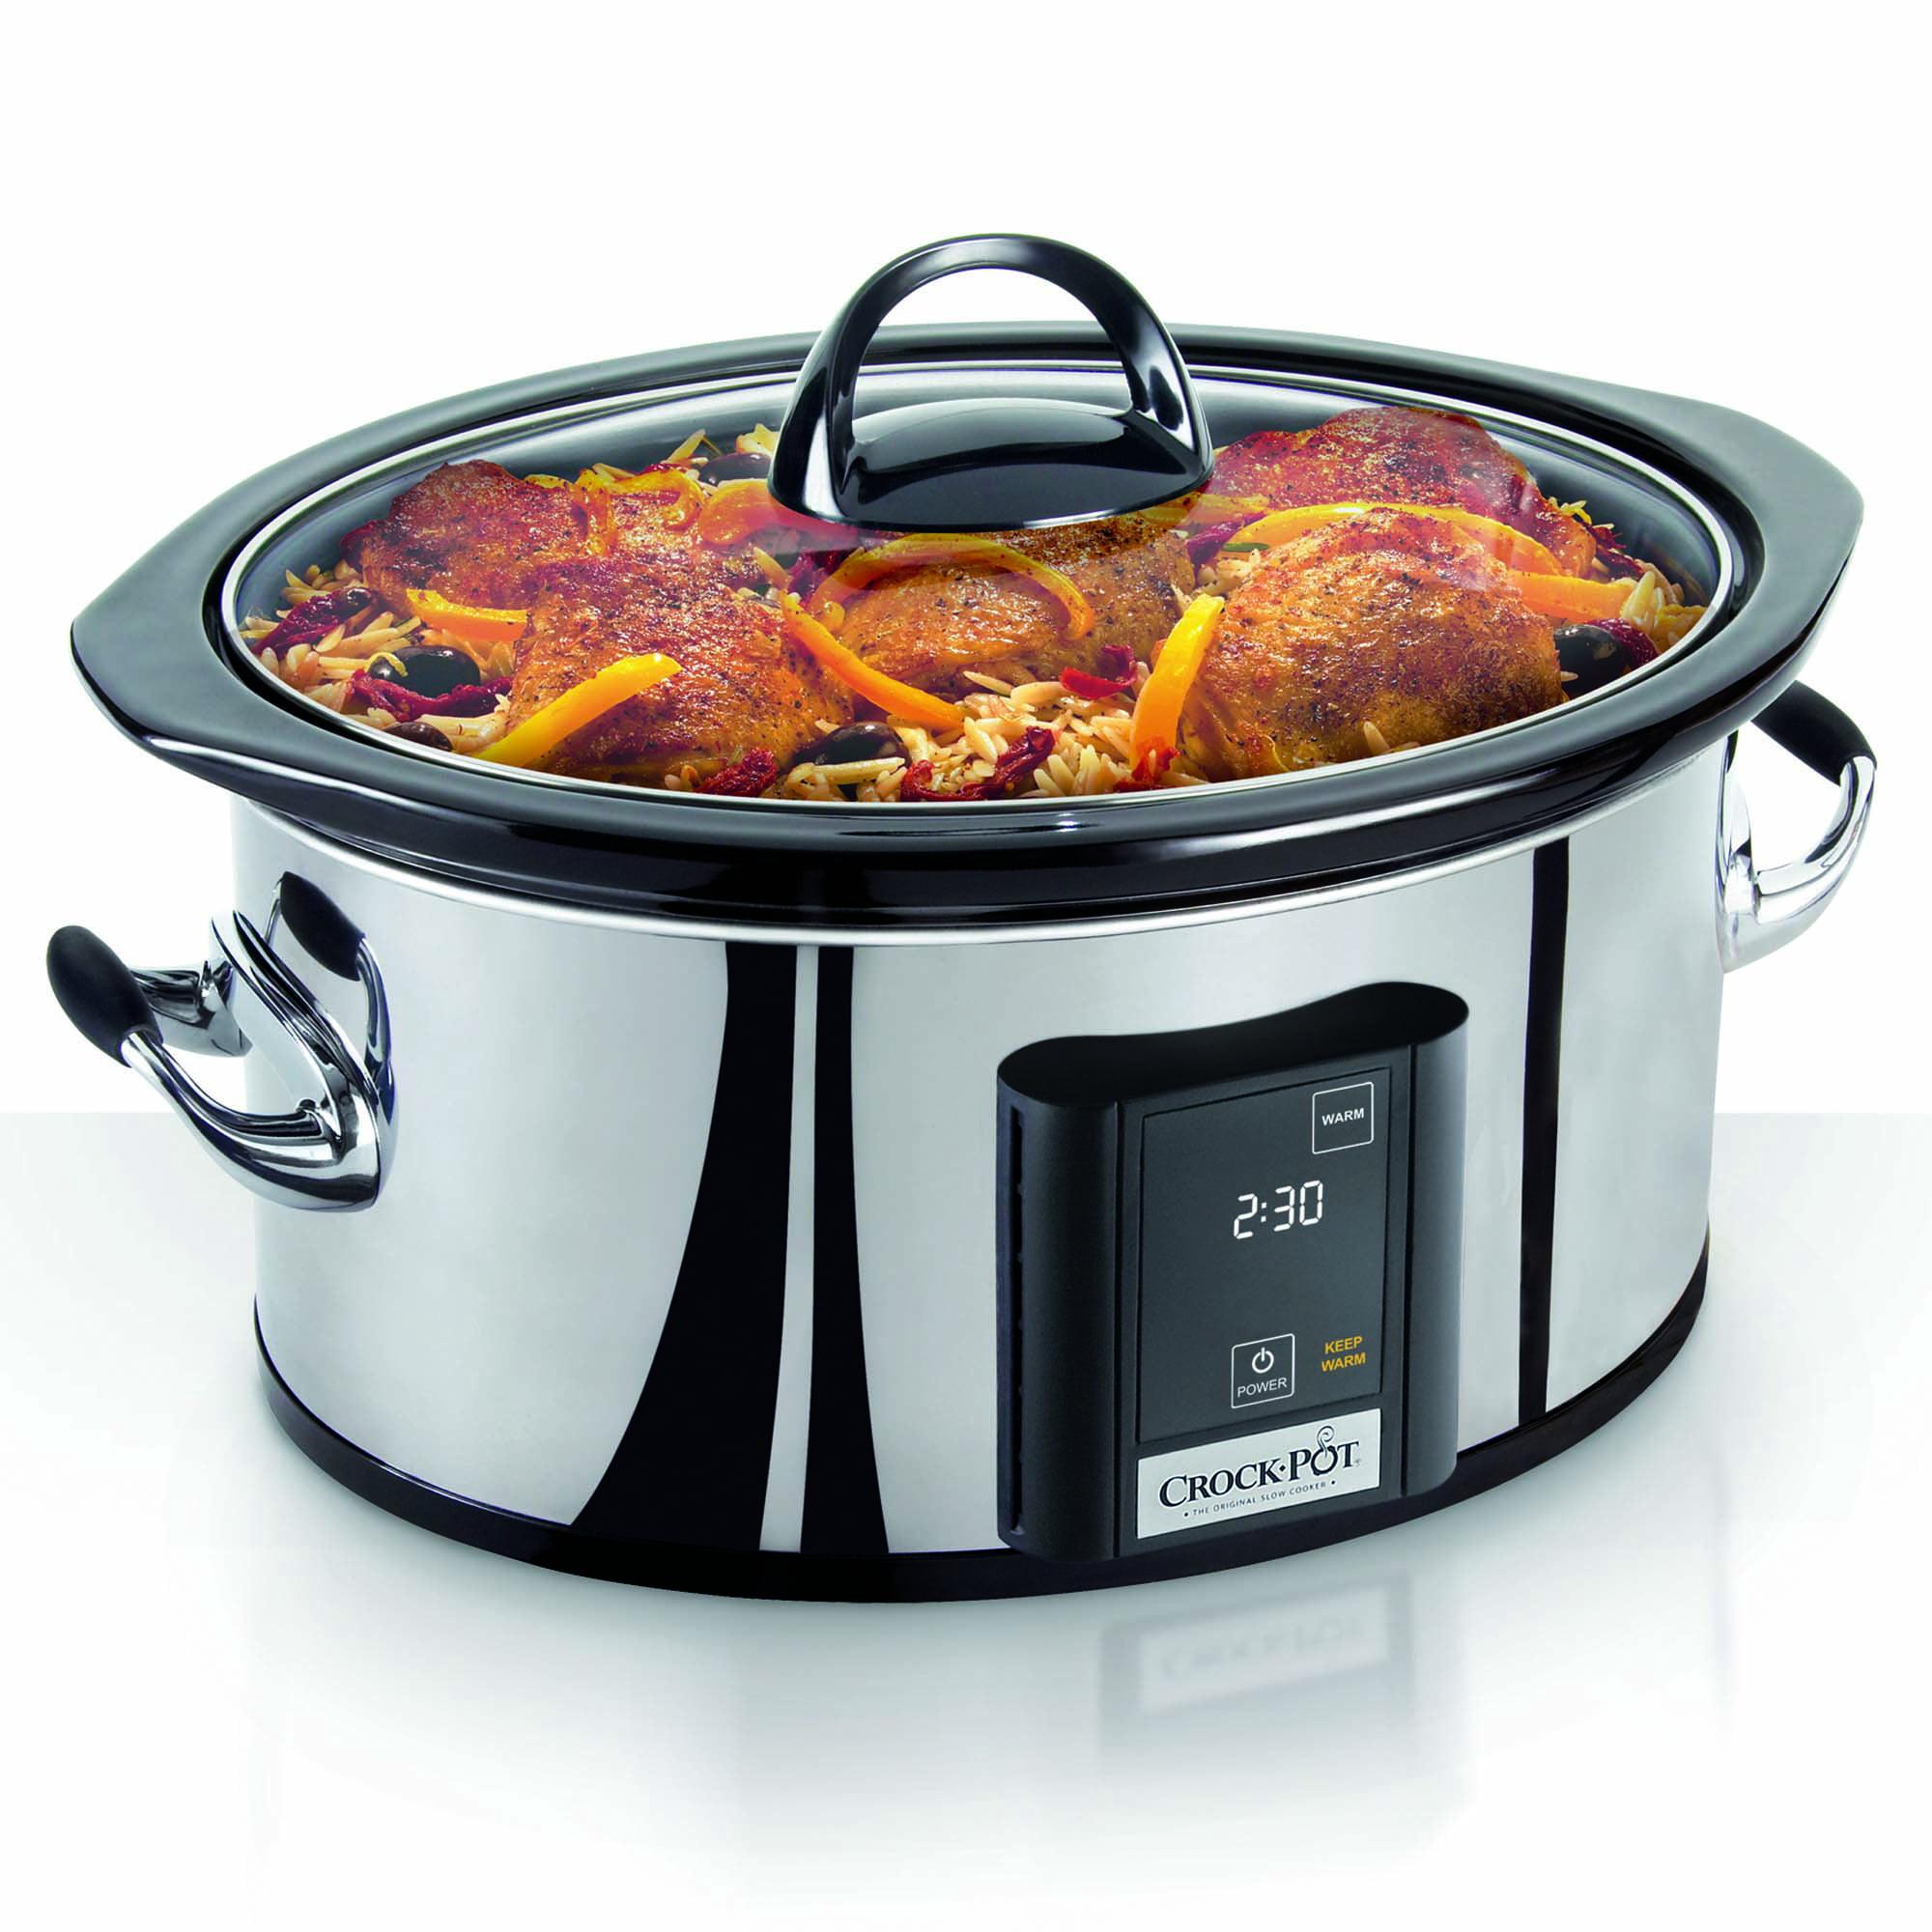 Crock-Pot 6.5 Qt. Programmable Touchscreen Slow Cooker, Silver